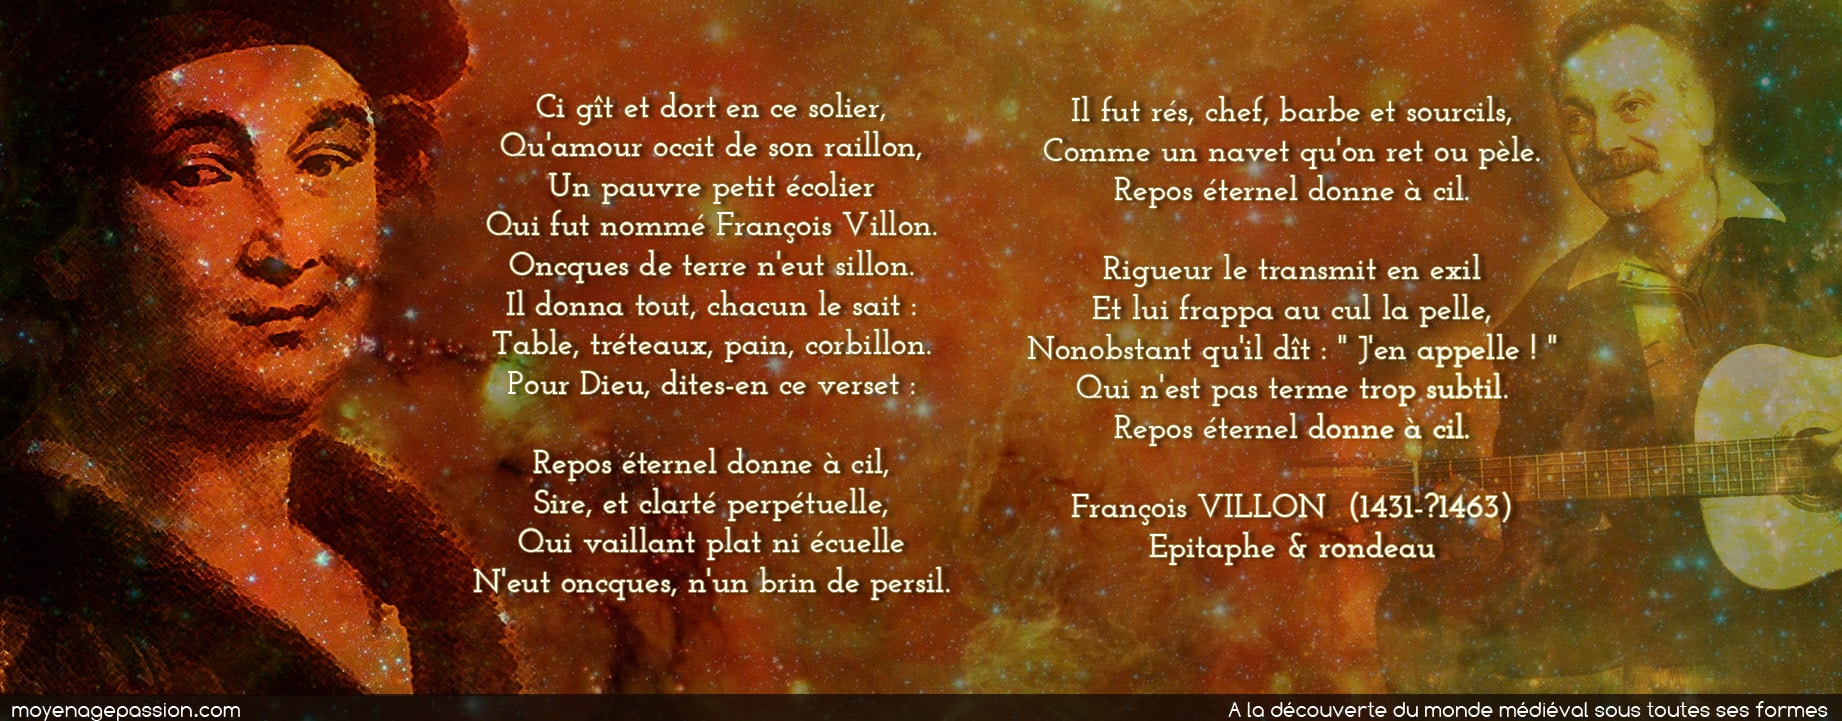 epitaphe_francois_villon_poesie_medievale_realiste_moyen_age_tardif_XV_brassens